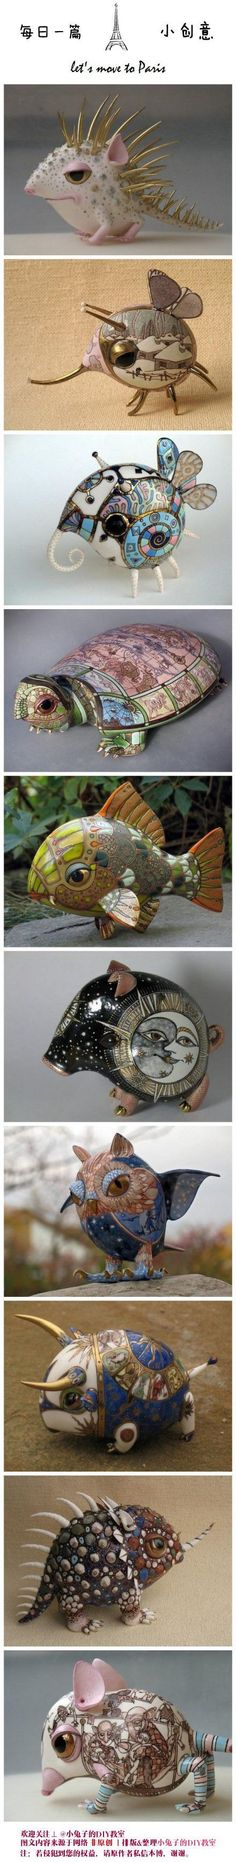 ceramic art from Russia: